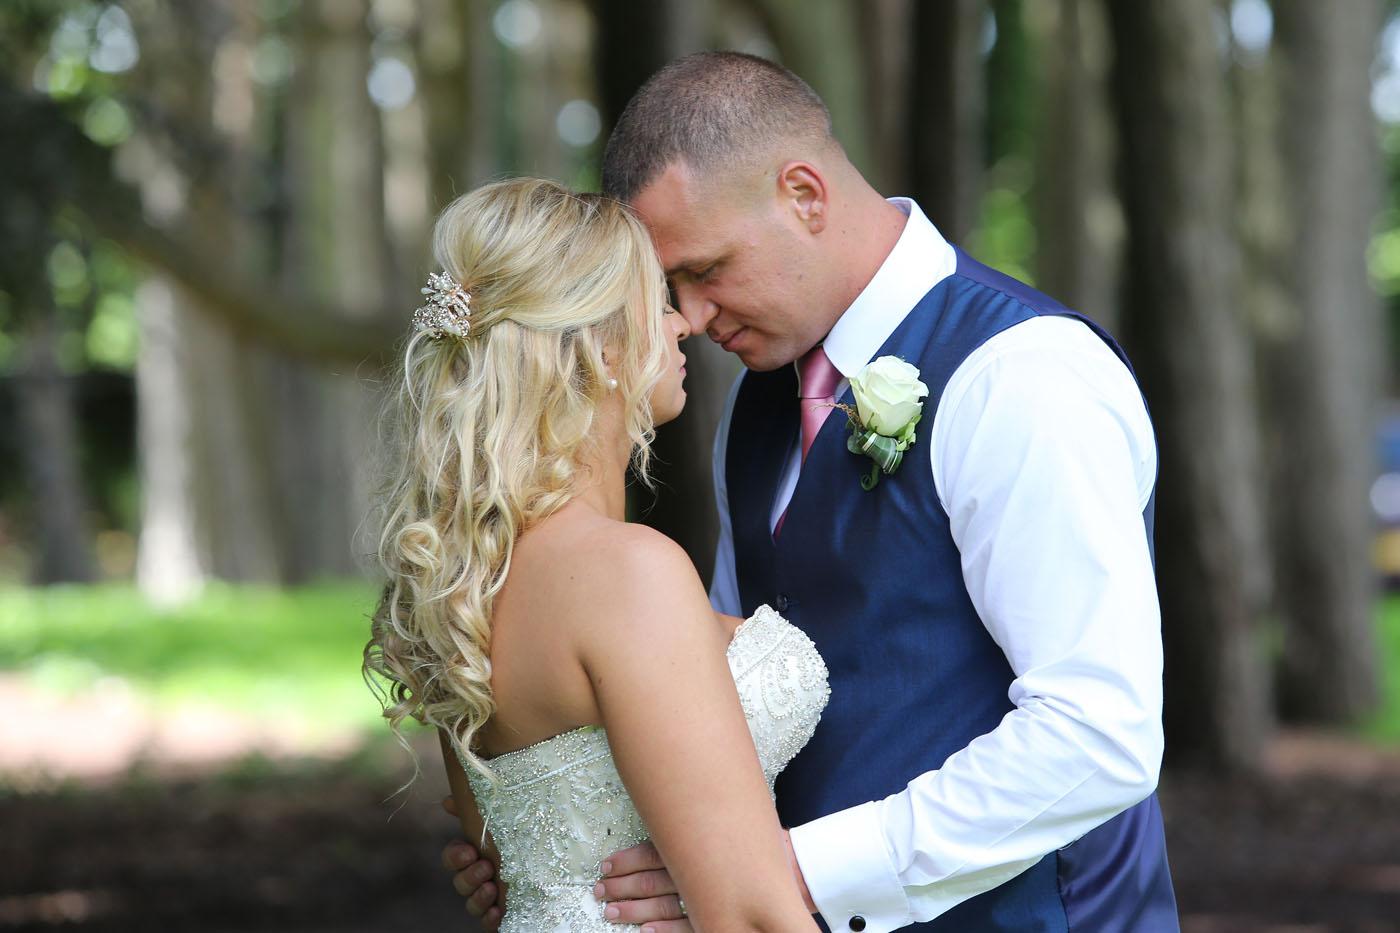 Wedding couple touching foreheads